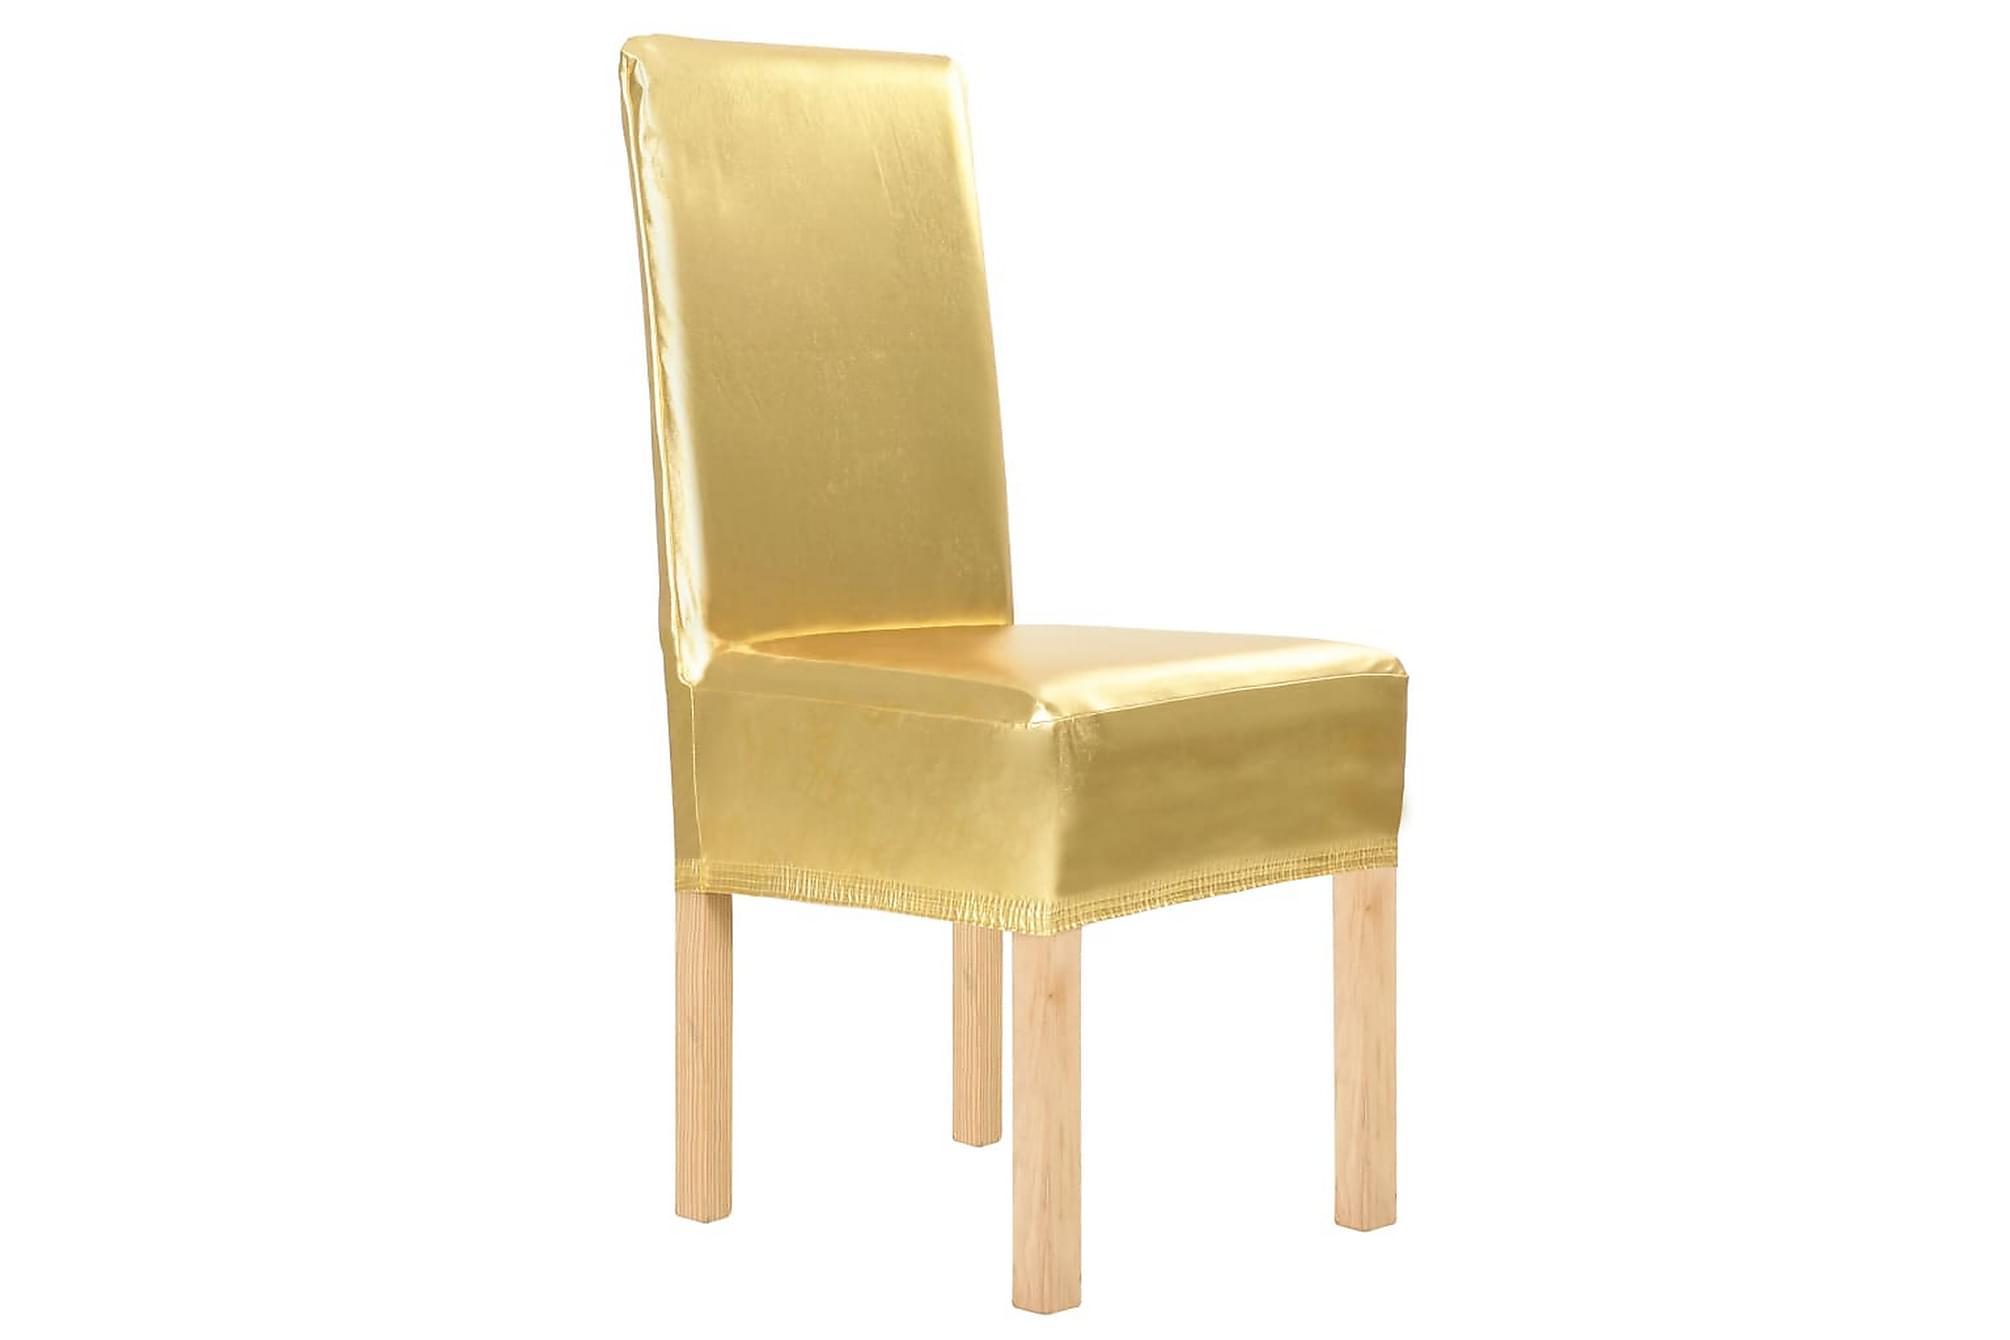 6 st Raka stolsöverdrag stretch guld